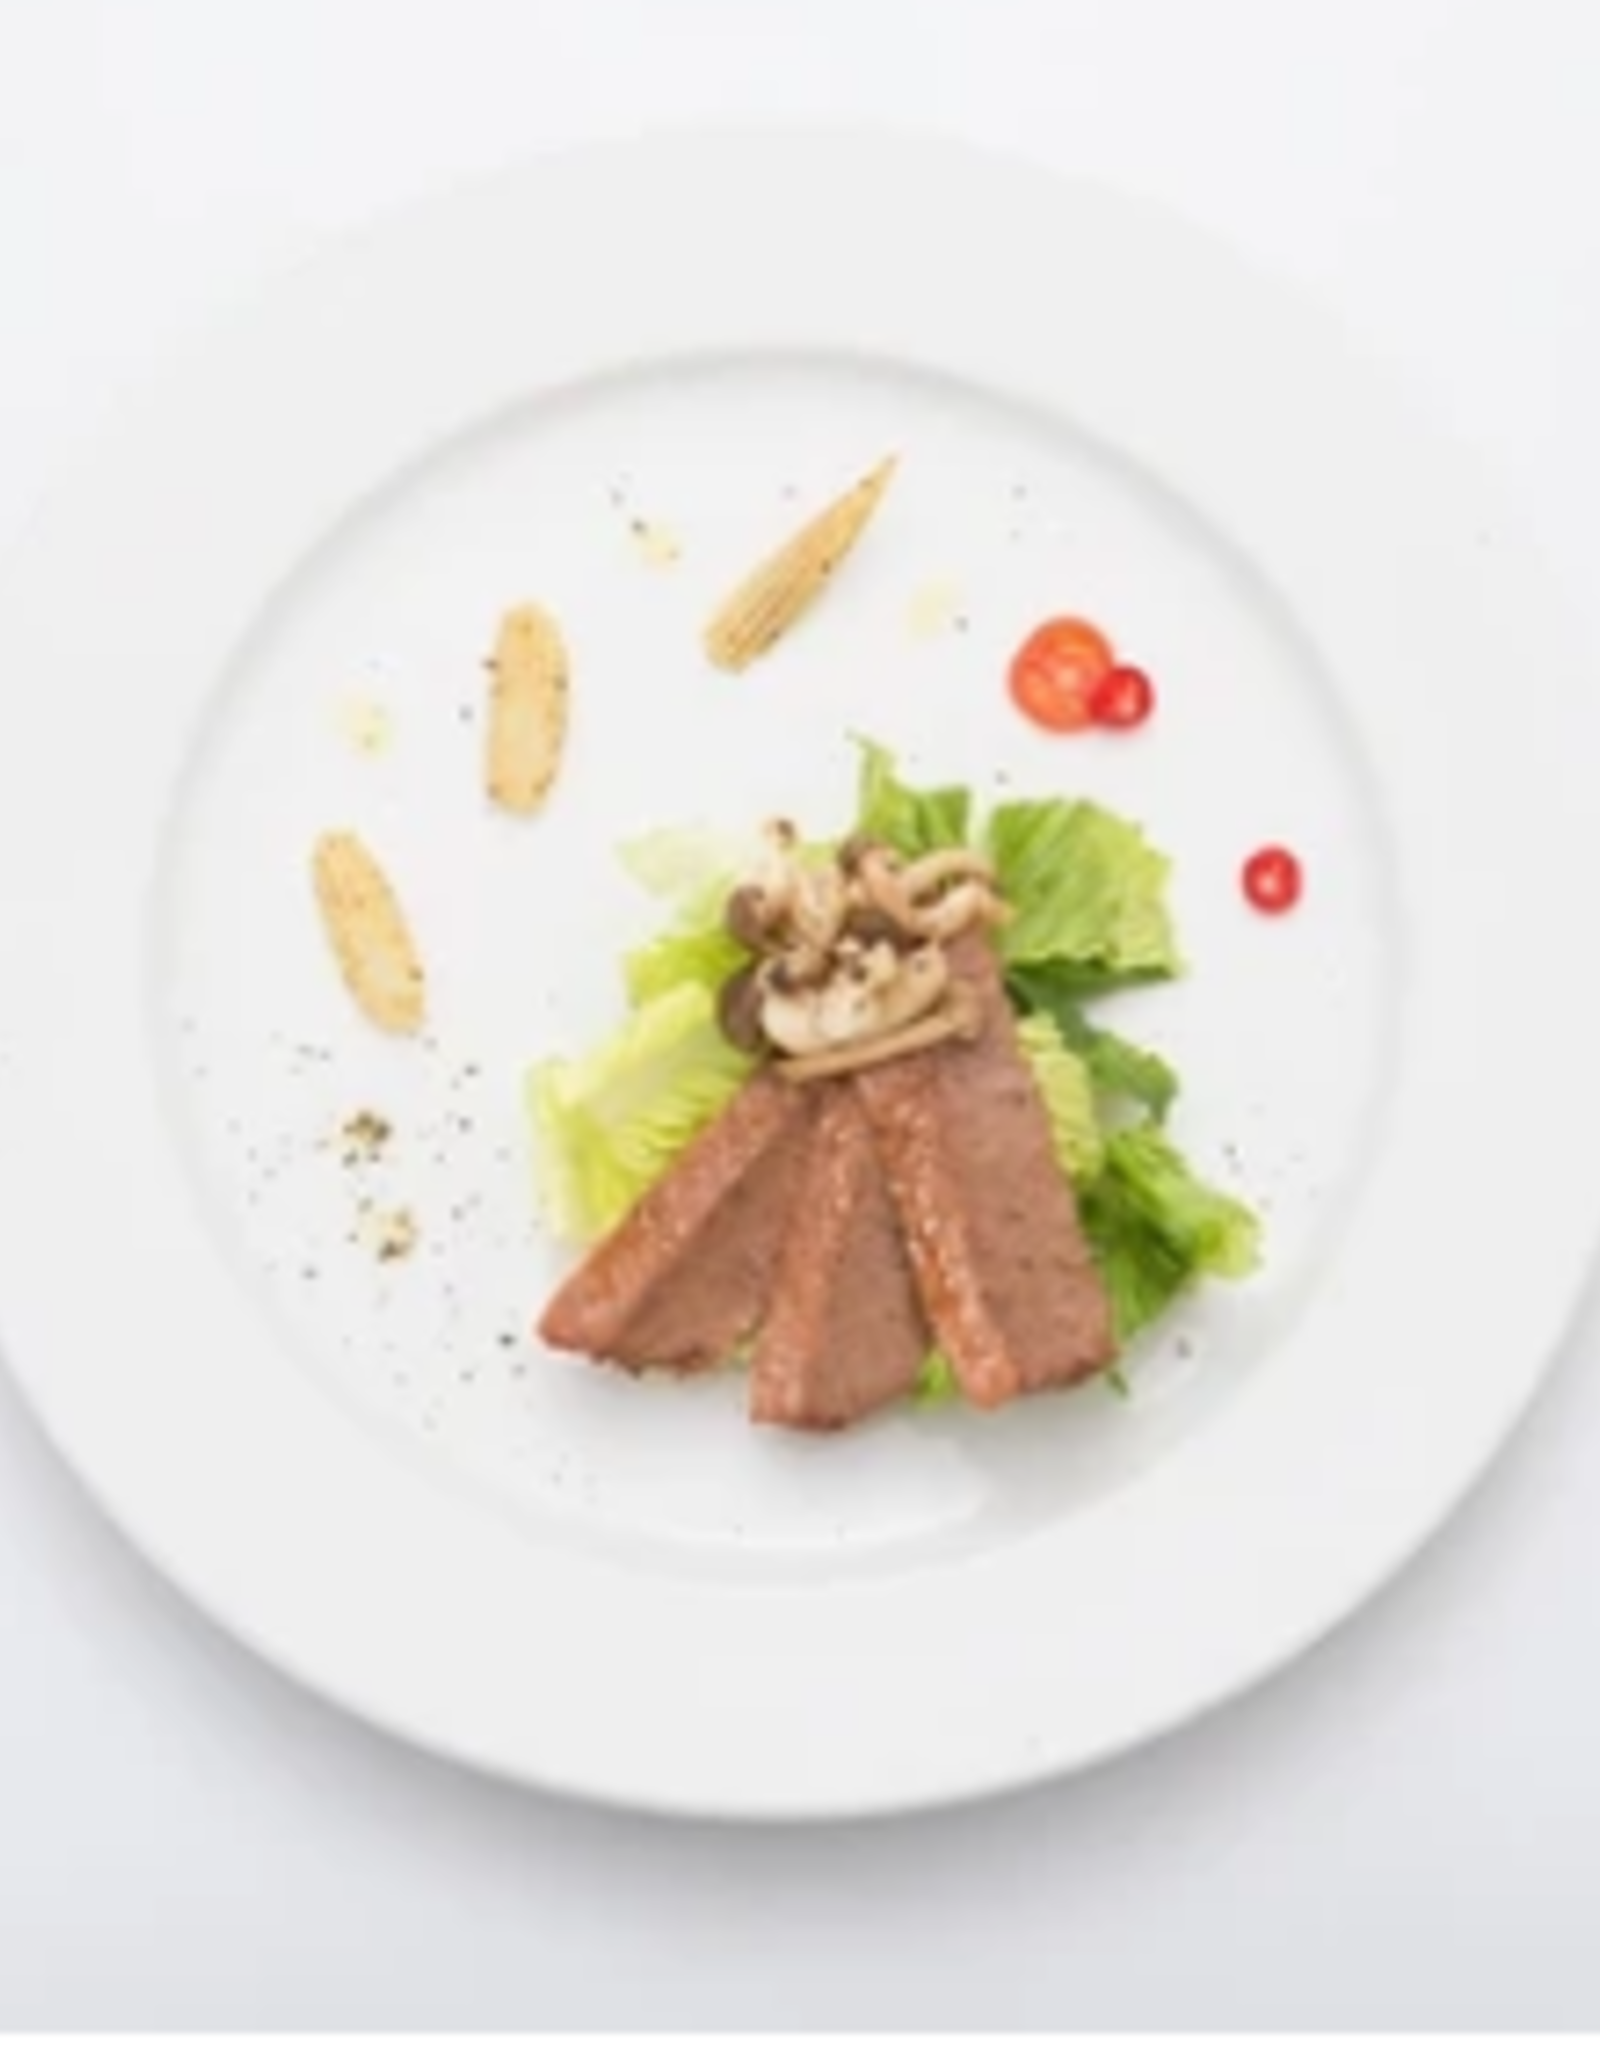 Vegefarm * 松珍 (VF) Vege Steak (S)*(松珍) 素牛排 (S)